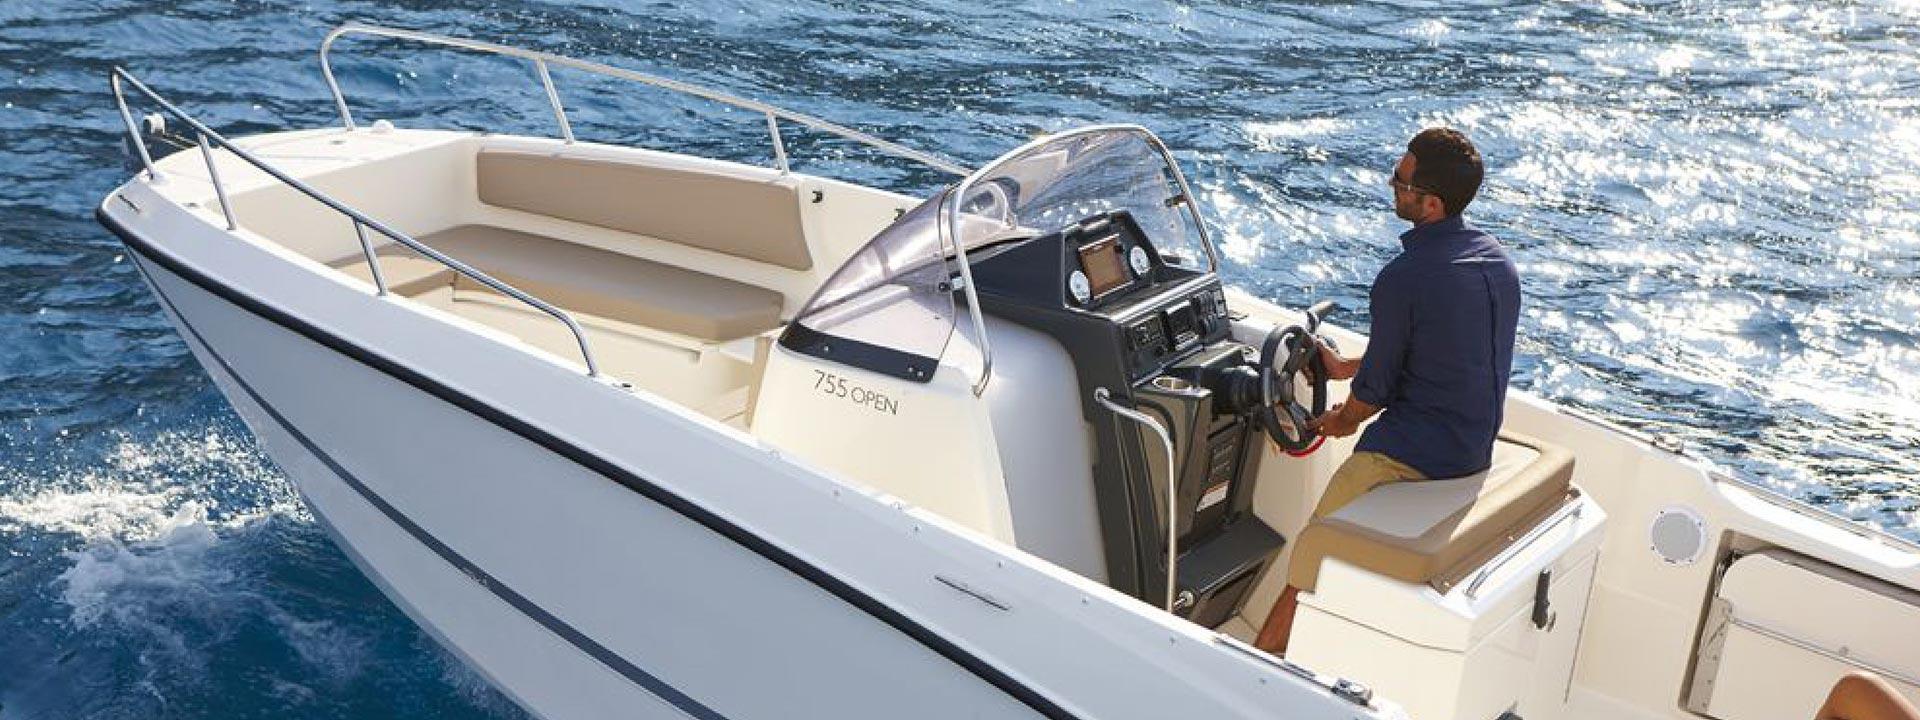 mayer-charter-boat-header-quicksilver-activ-755-open-04